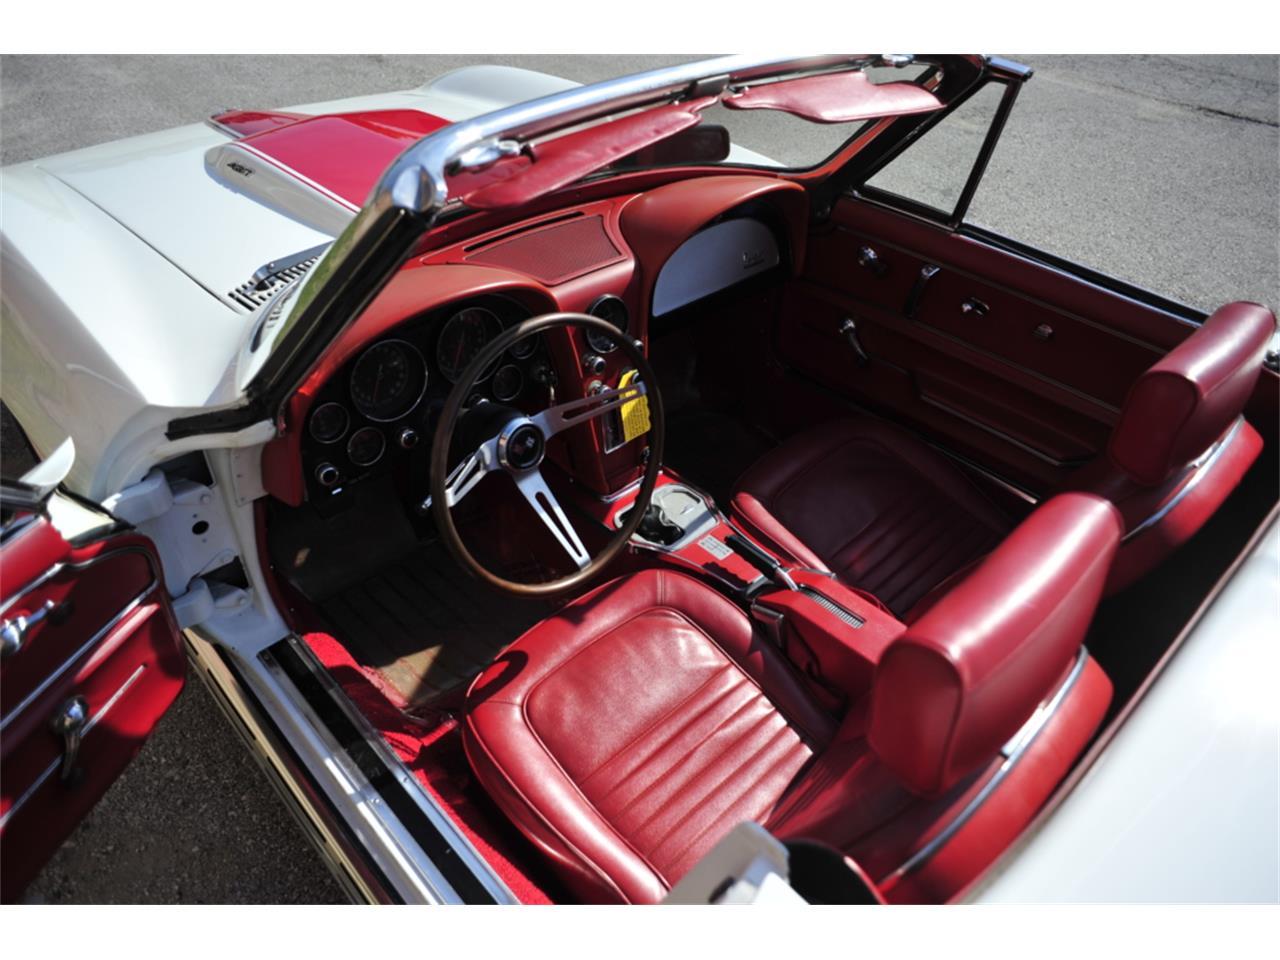 Large Picture of Classic '67 Corvette - $129,995.00 - PZ9R